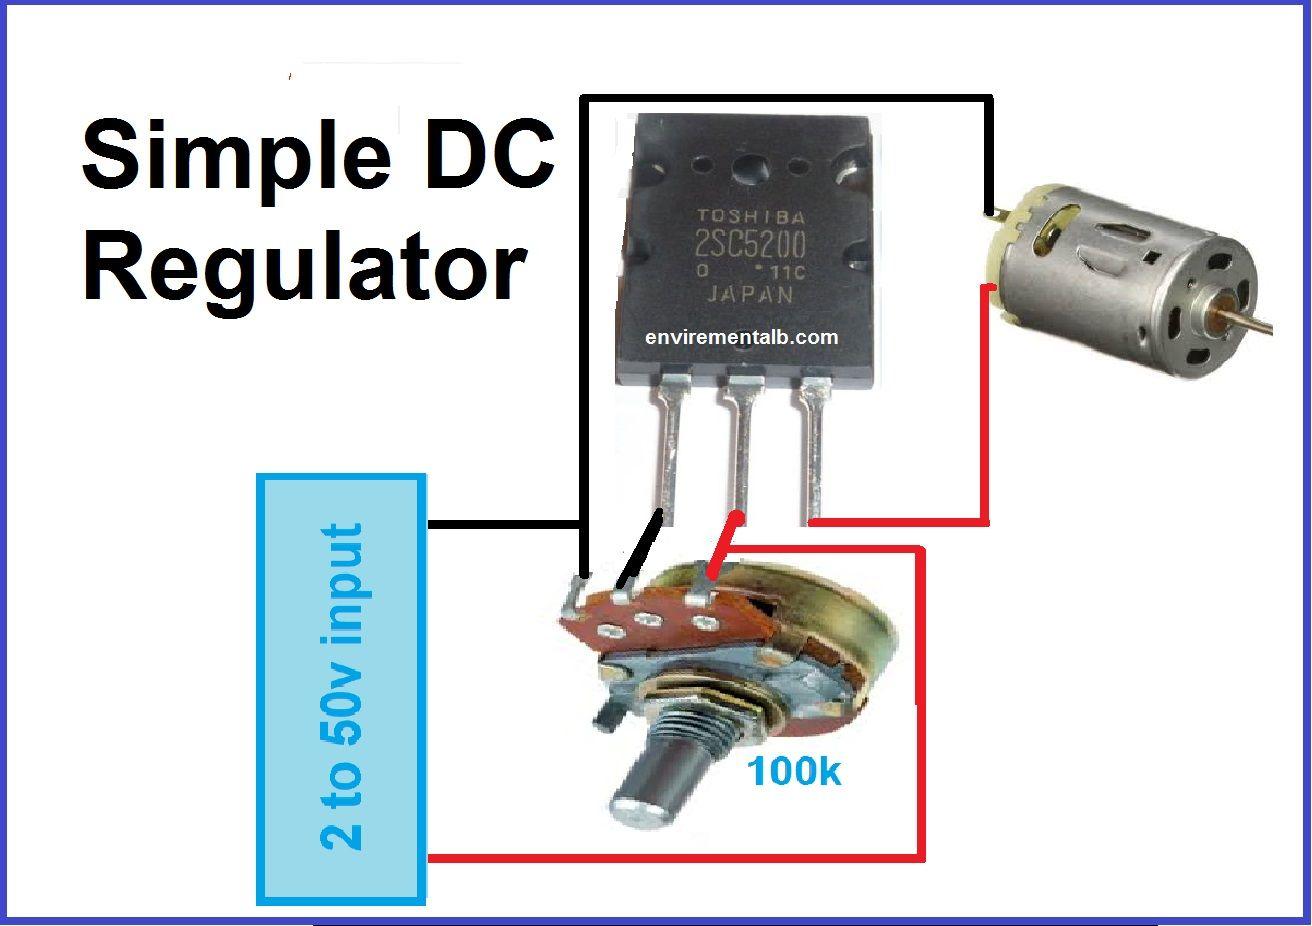 Voltage Regulator Using Transistor Envirementalb Com In 2020 Voltage Regulator Regulators Transistors